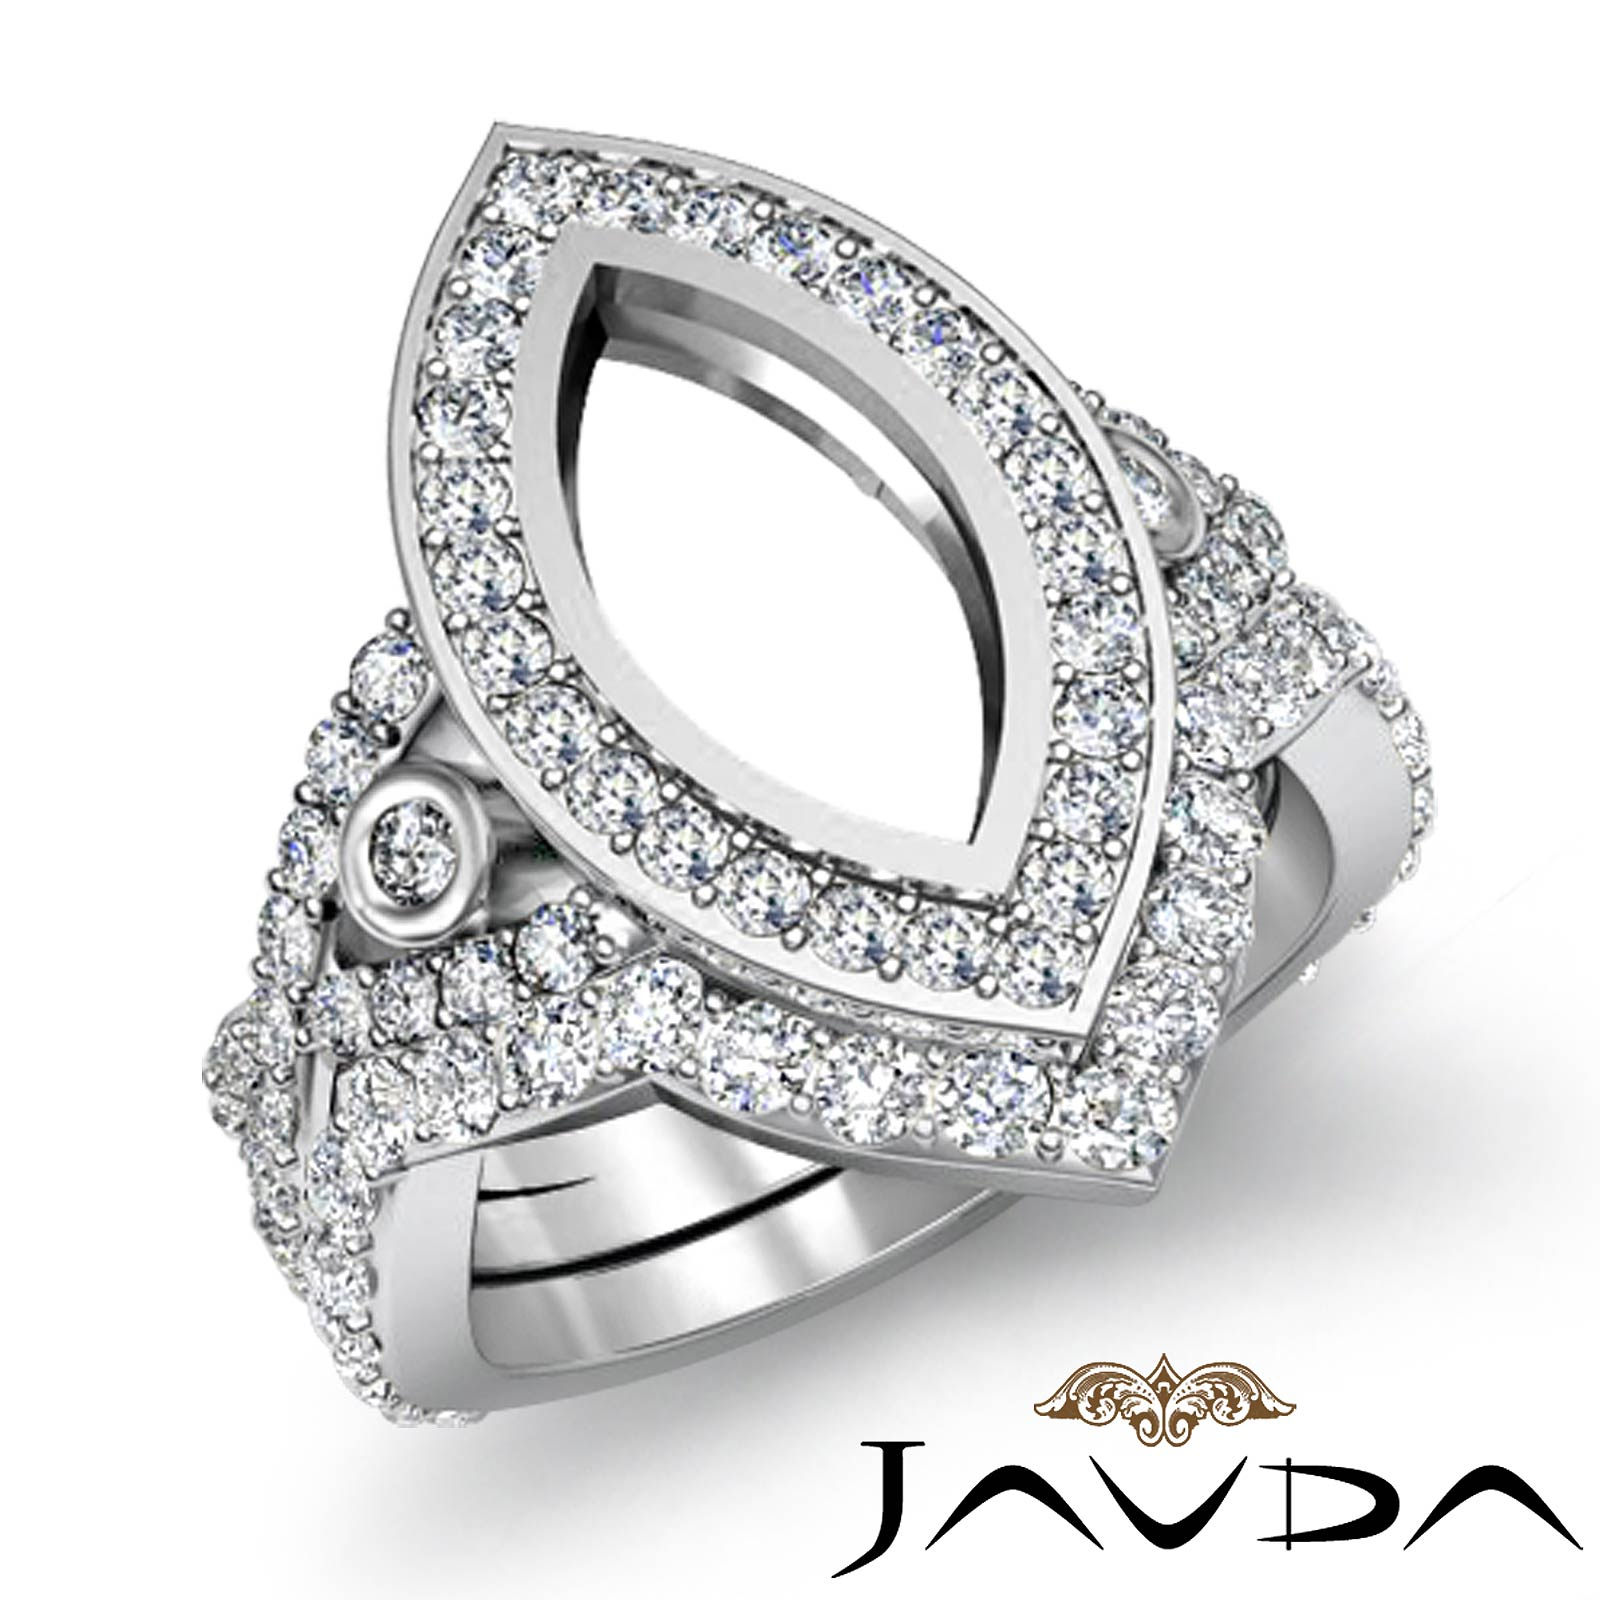 Marquise Diamond Engagement Ring Bridal Sets Platinum 950 Semi Mount 2 8Ct